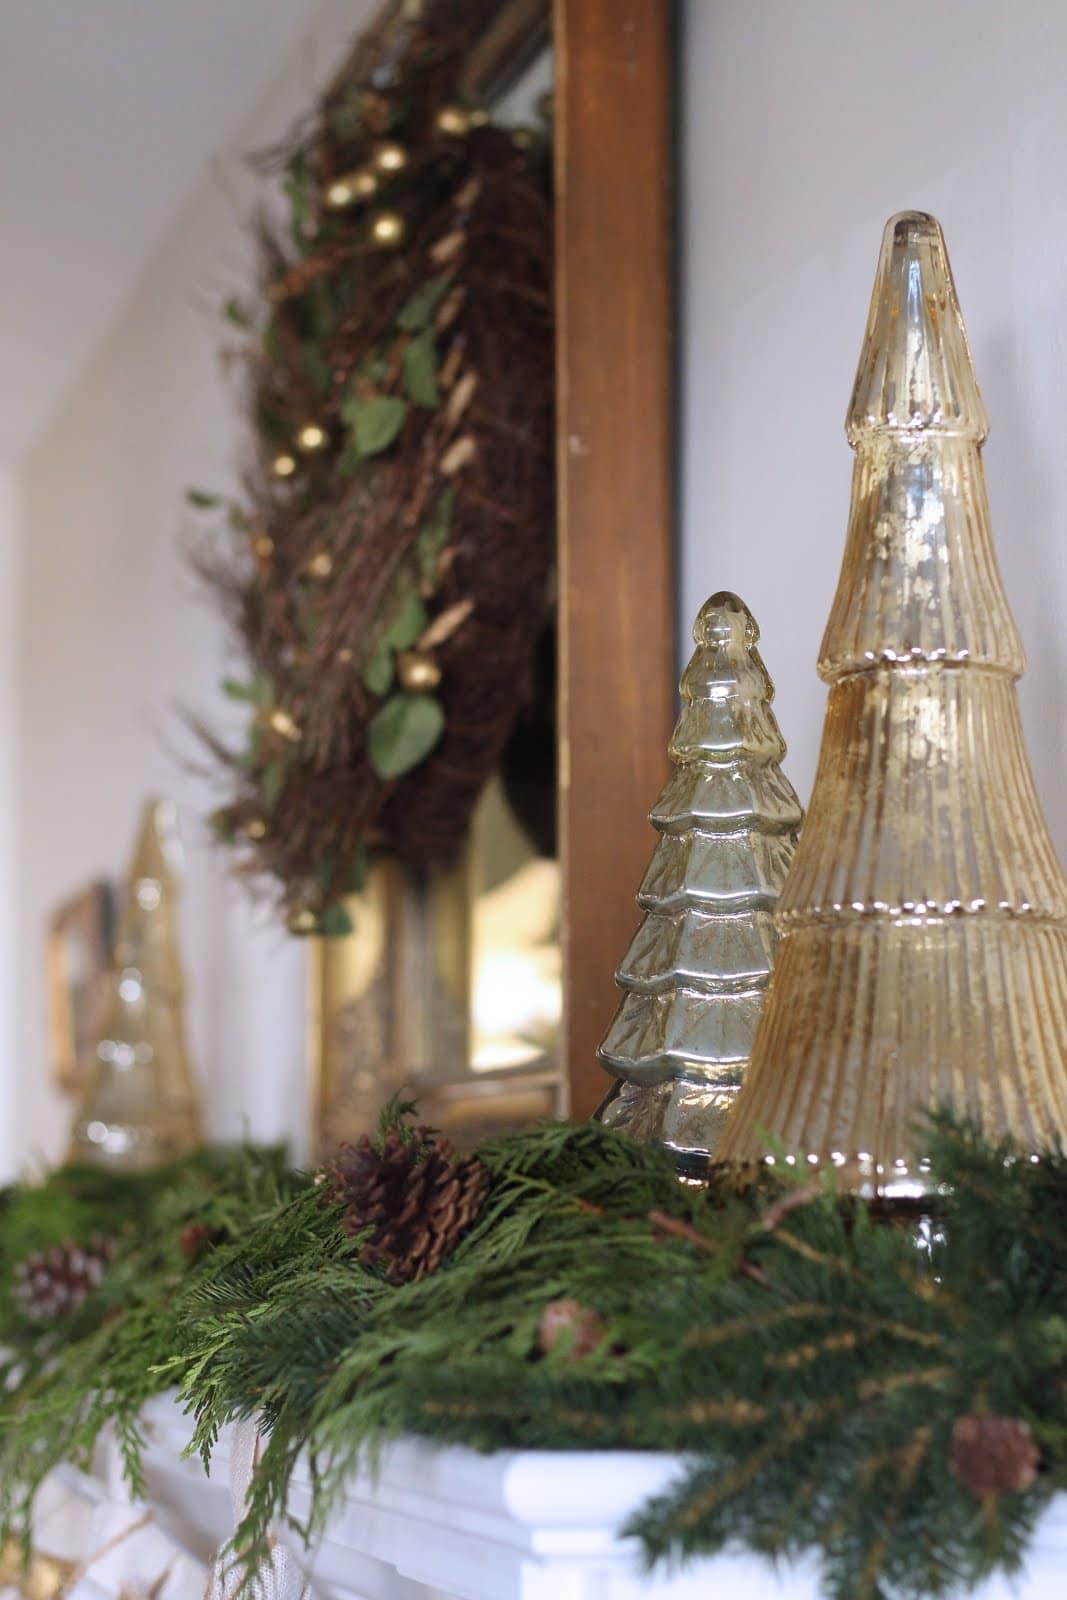 Restoration Hardware Christmas Decorations